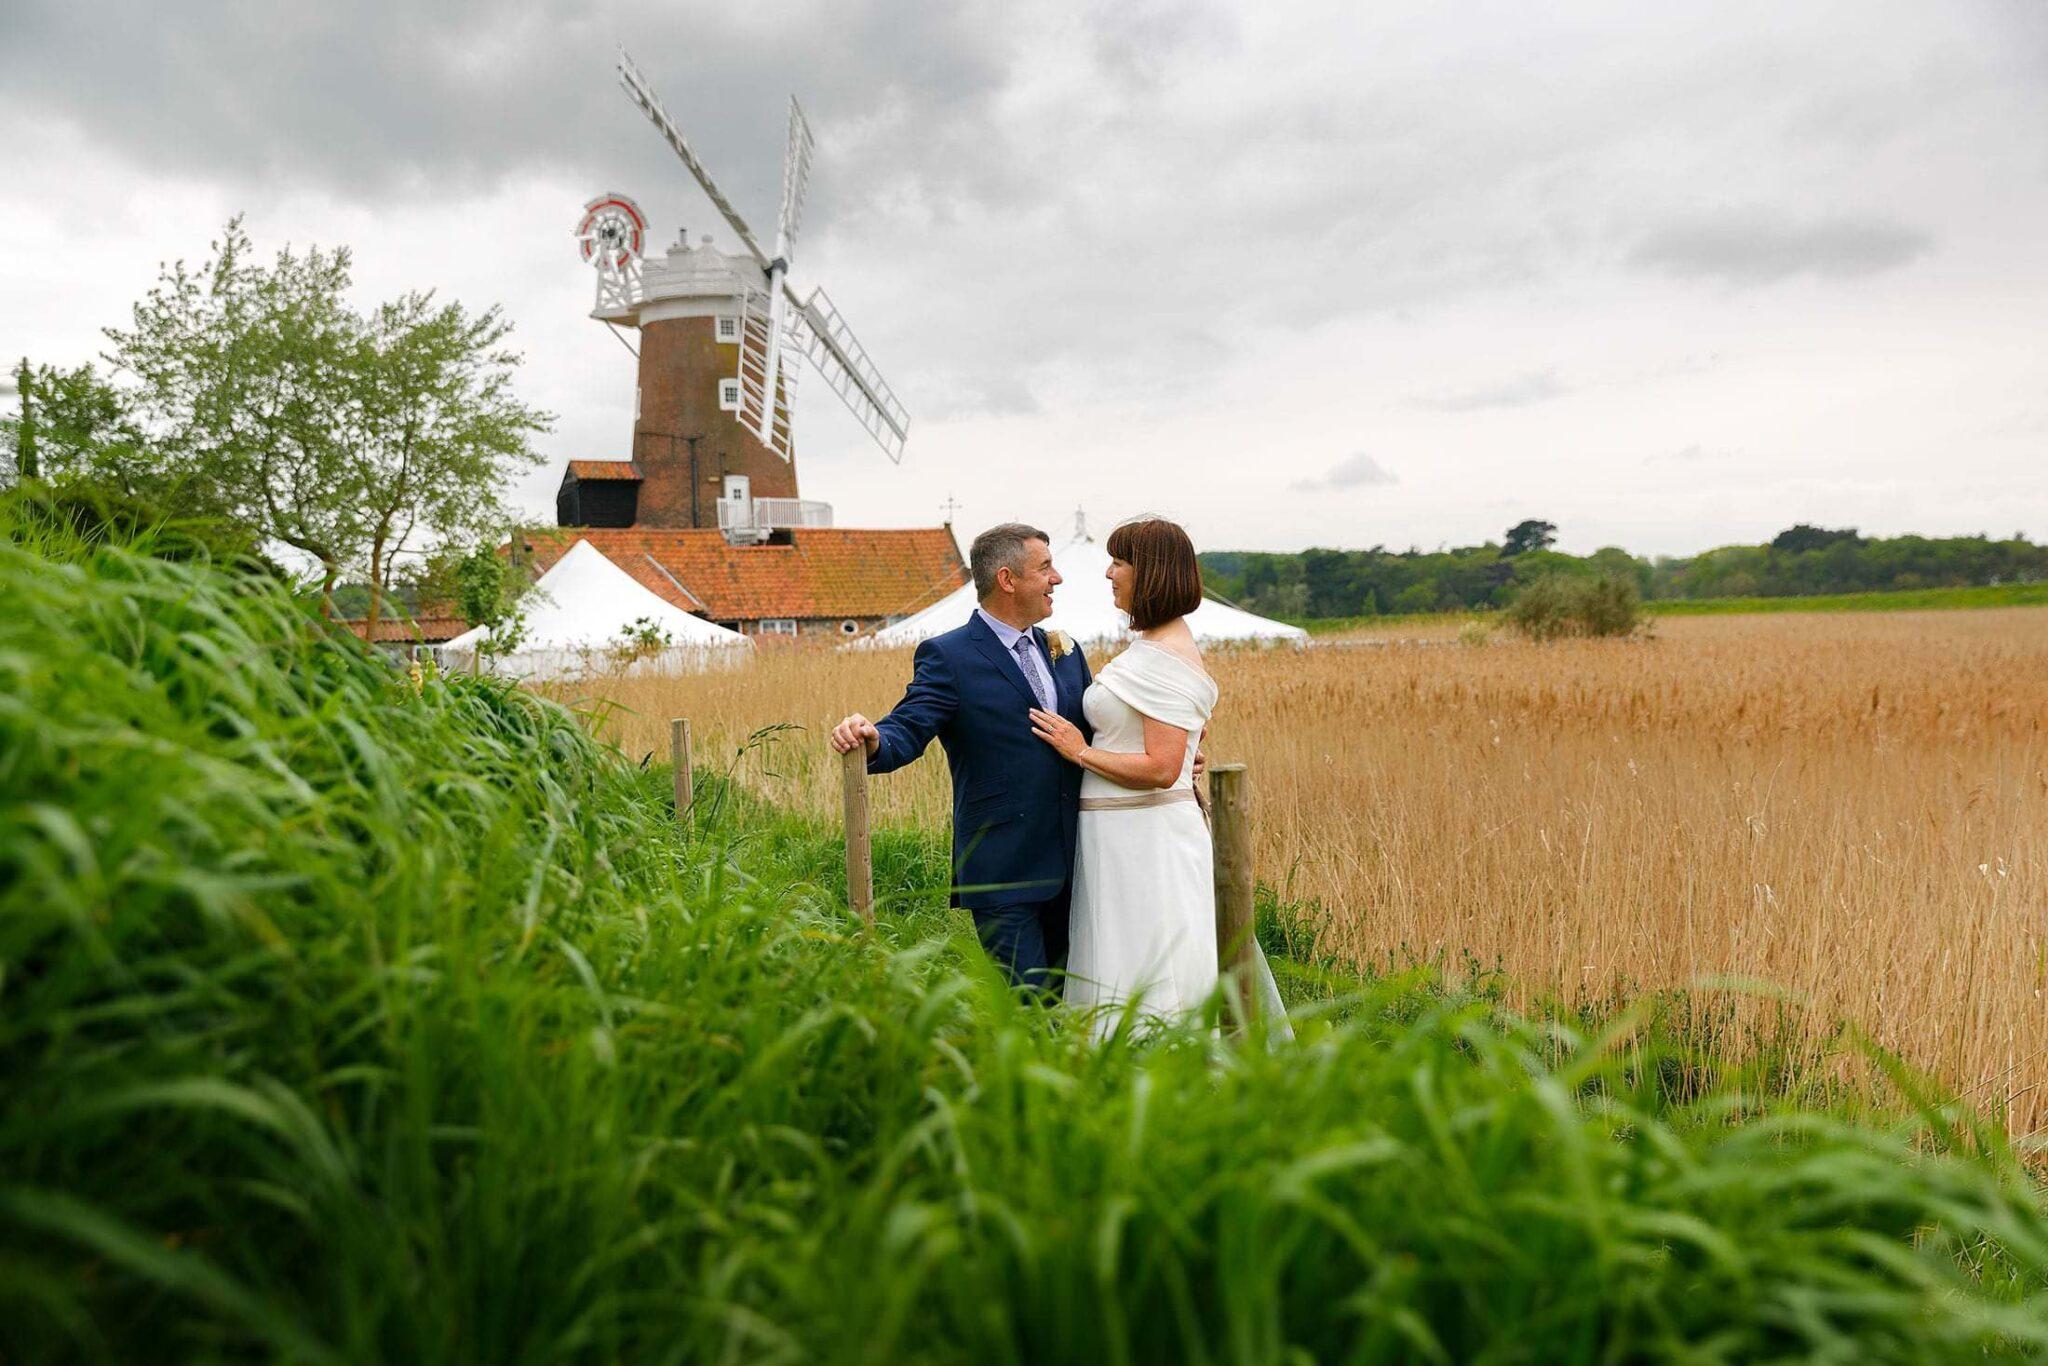 CLEY WINDMILL WEDDING PHOTOS OF KIRSTY & DOUG